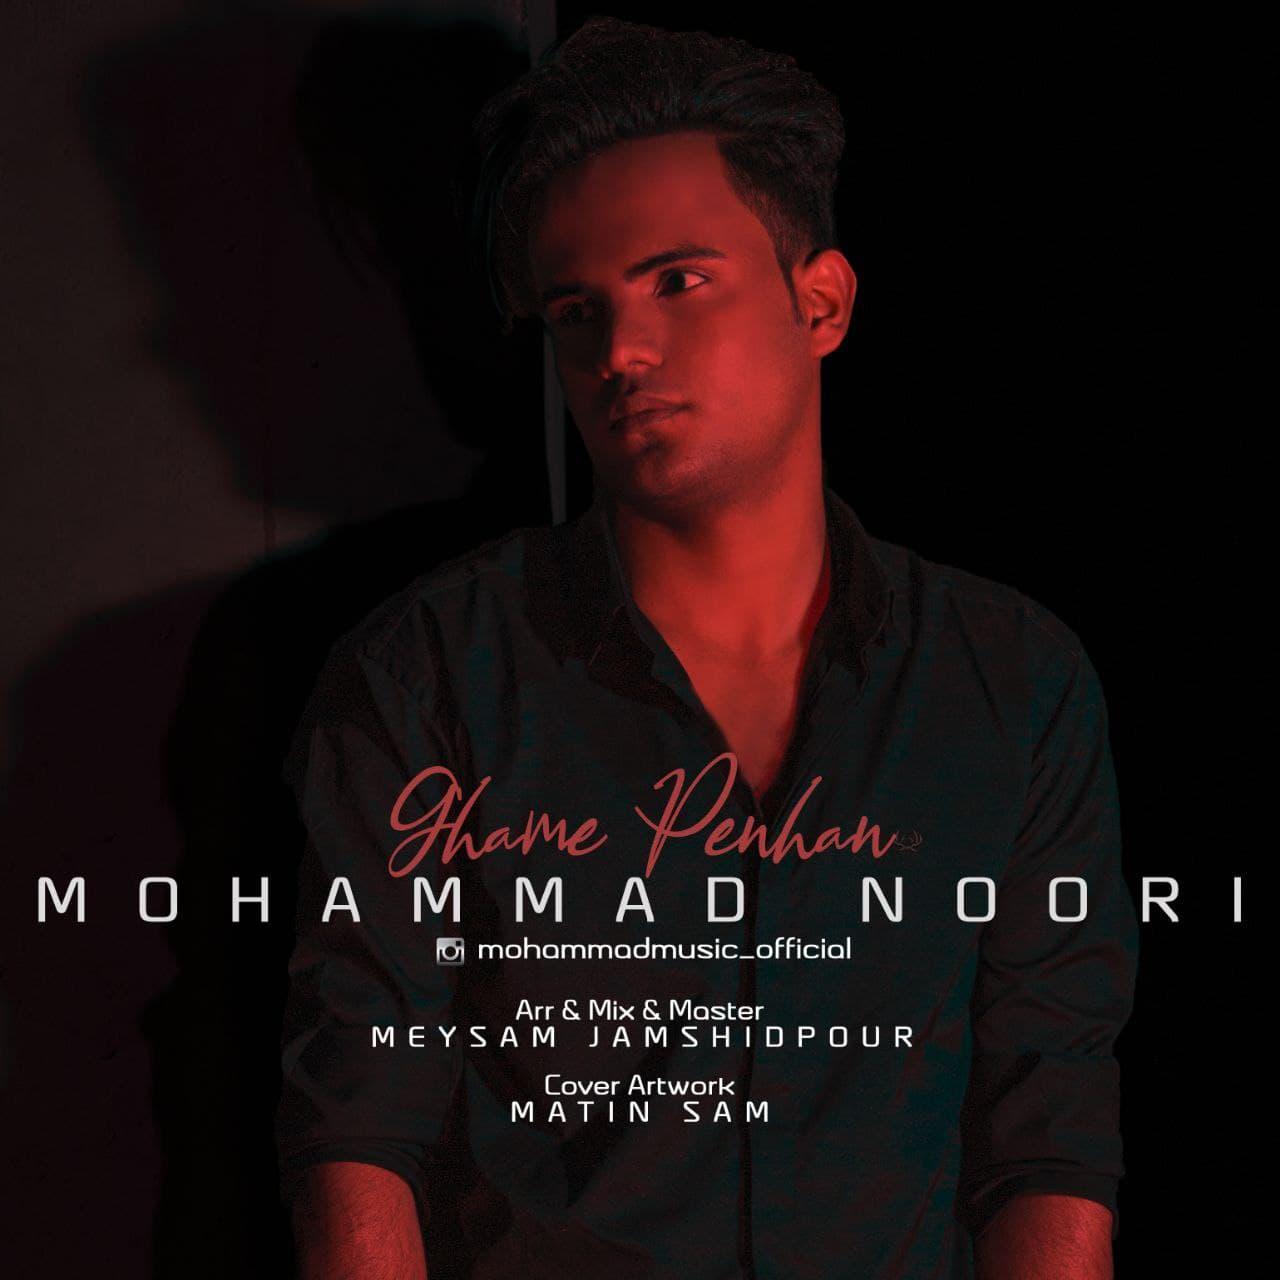 Mohammad Noori – Ghame Penhan